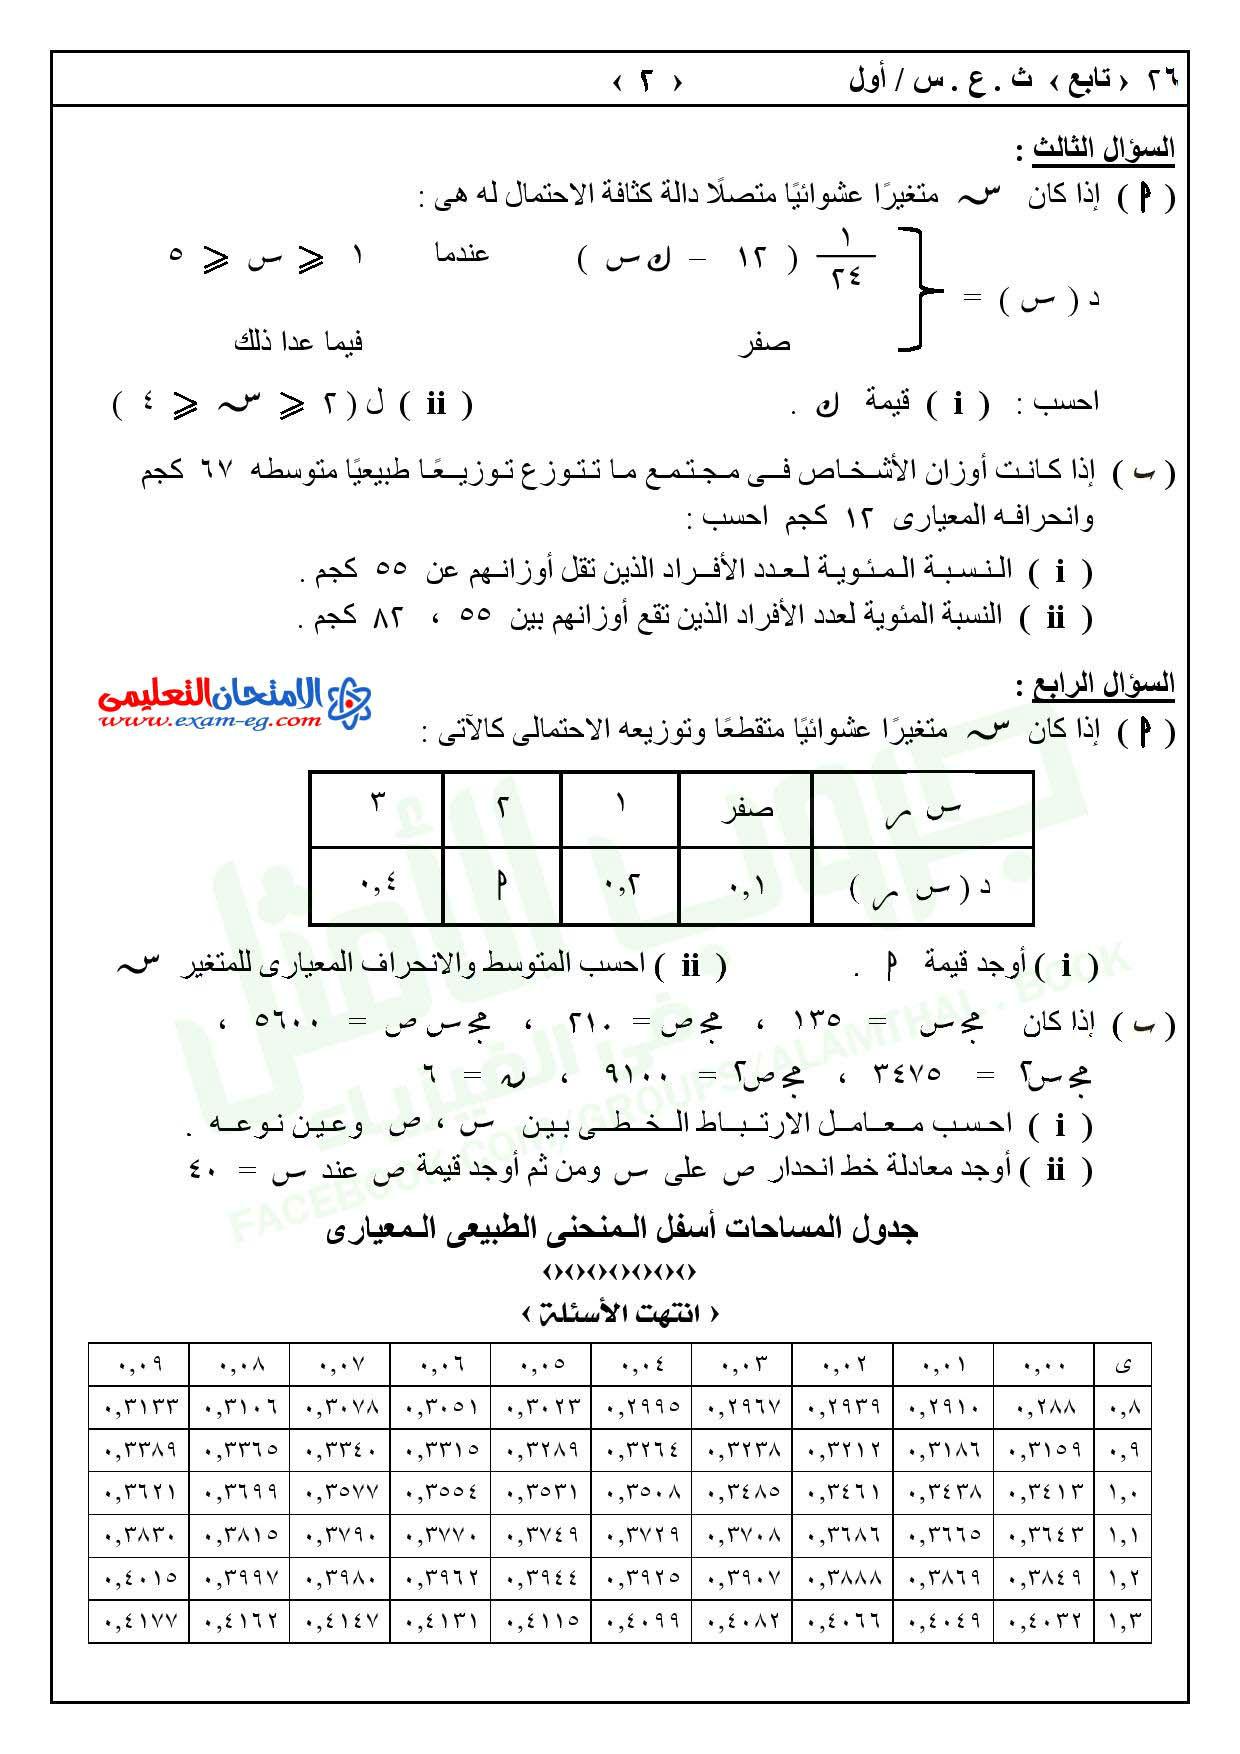 exam-eg.com_1429366926172.jpg